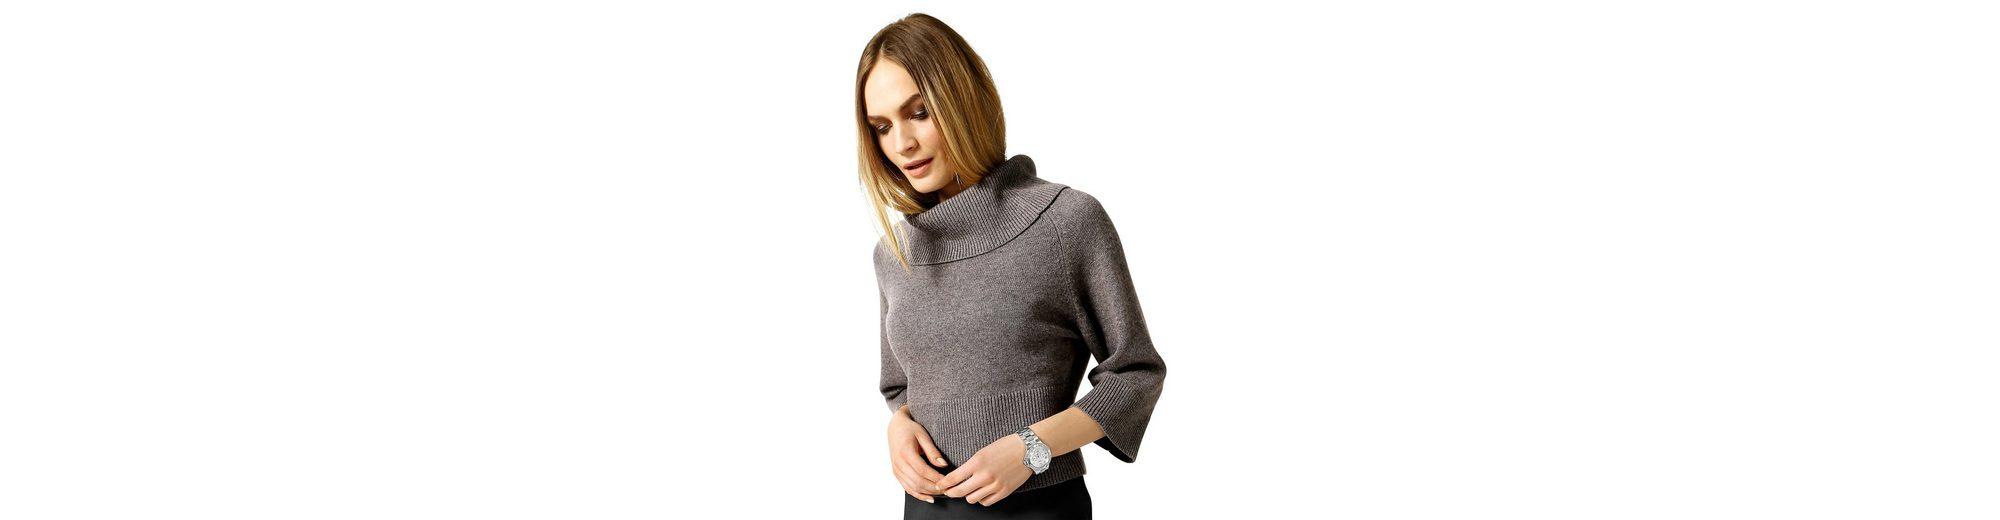 Alba Moda Pullover Billig Für Billig p8bzd2c